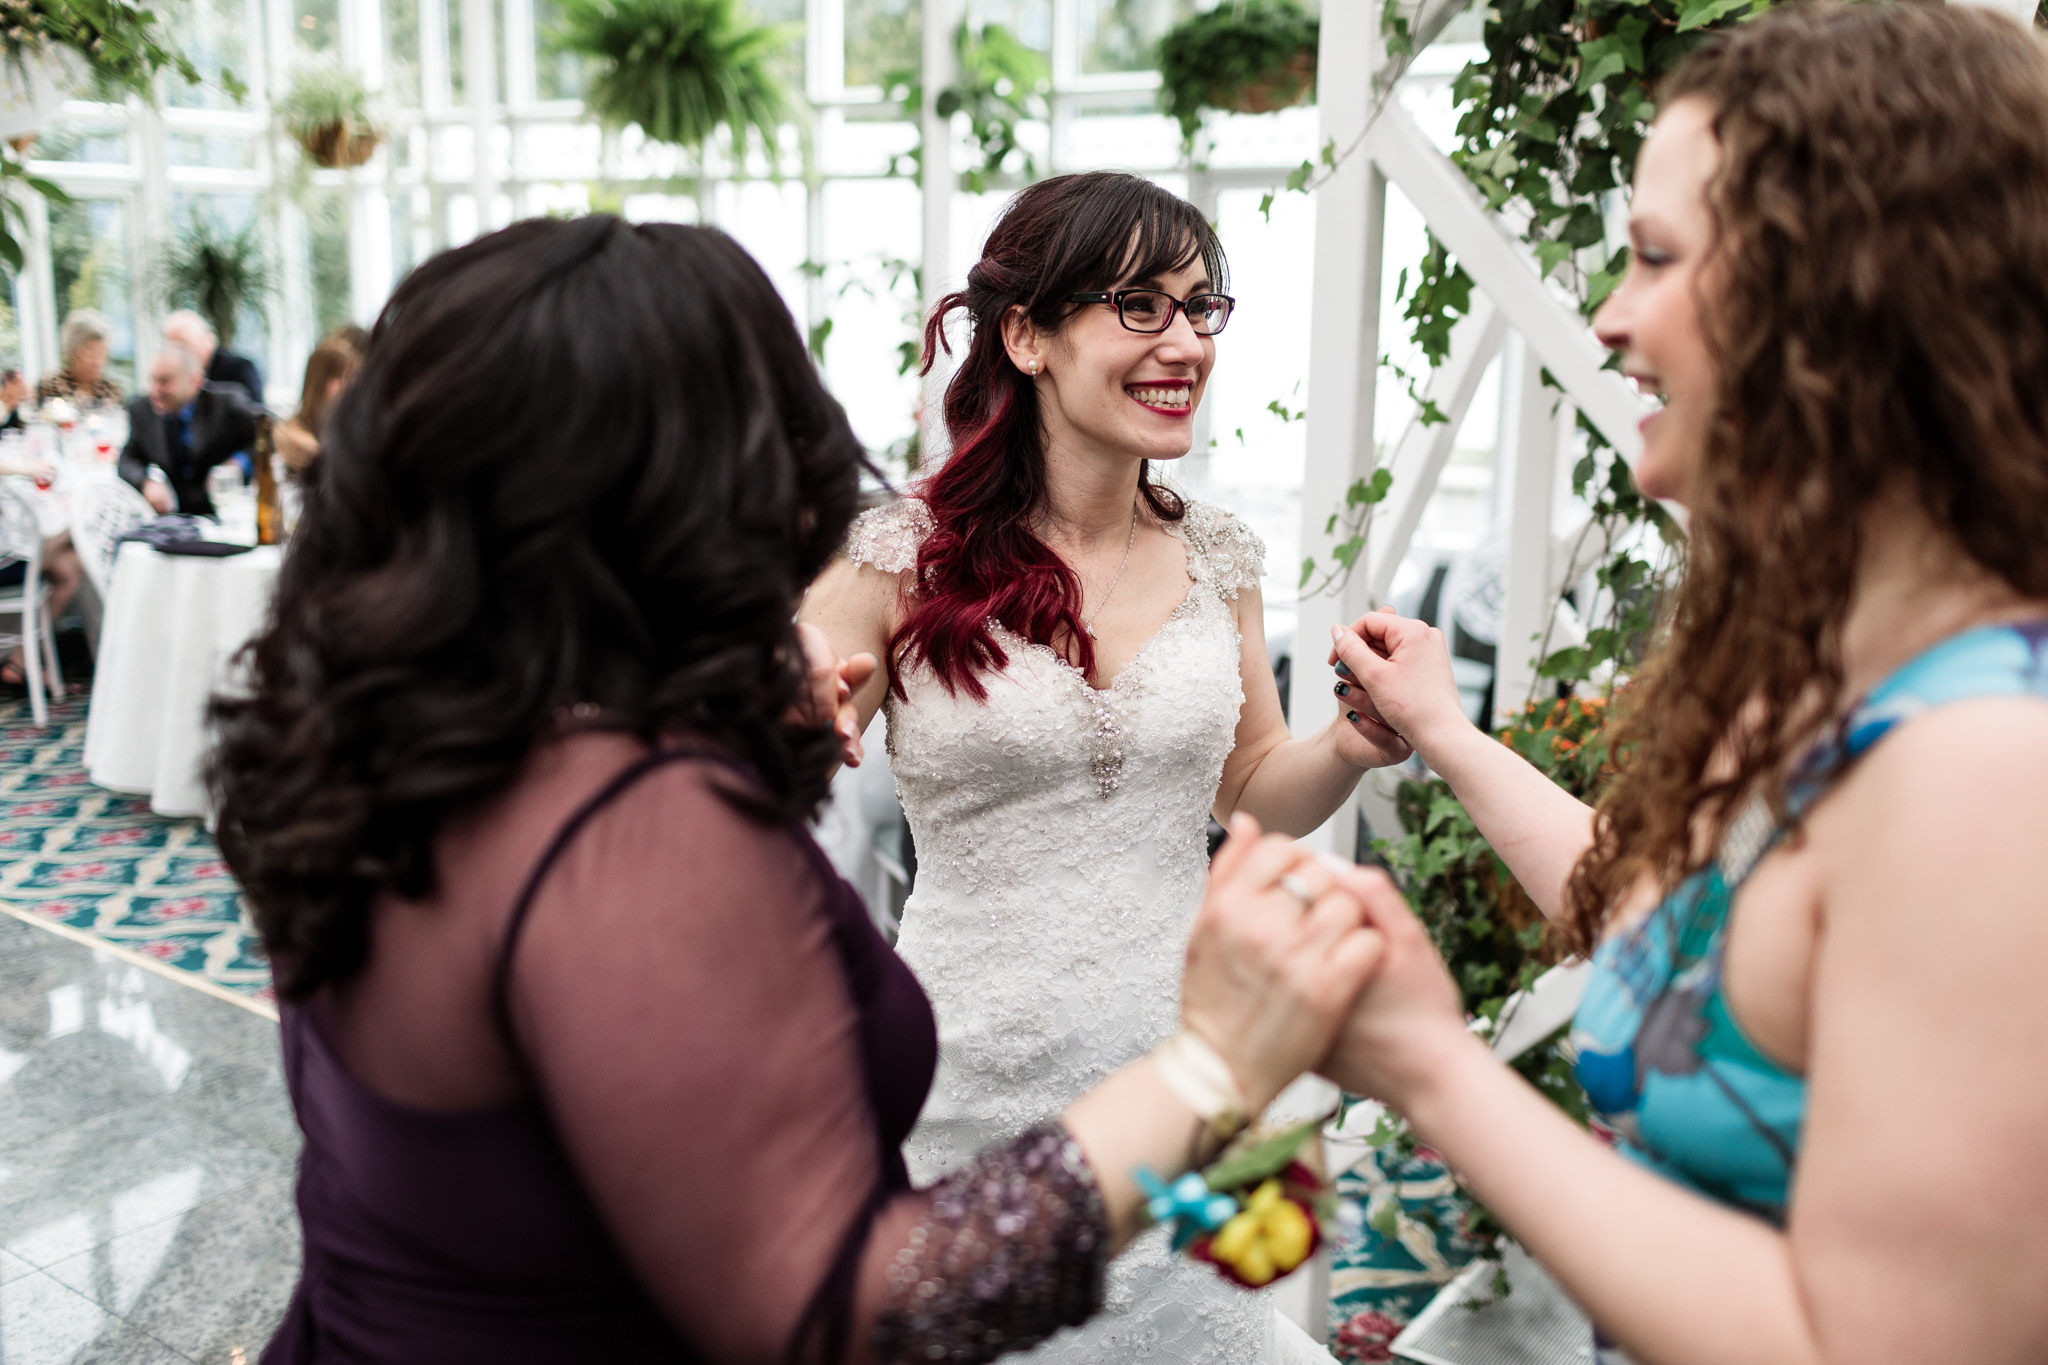 Hanchar_Madison_Hotel_NJ_Wedding_7R5A8911.jpg